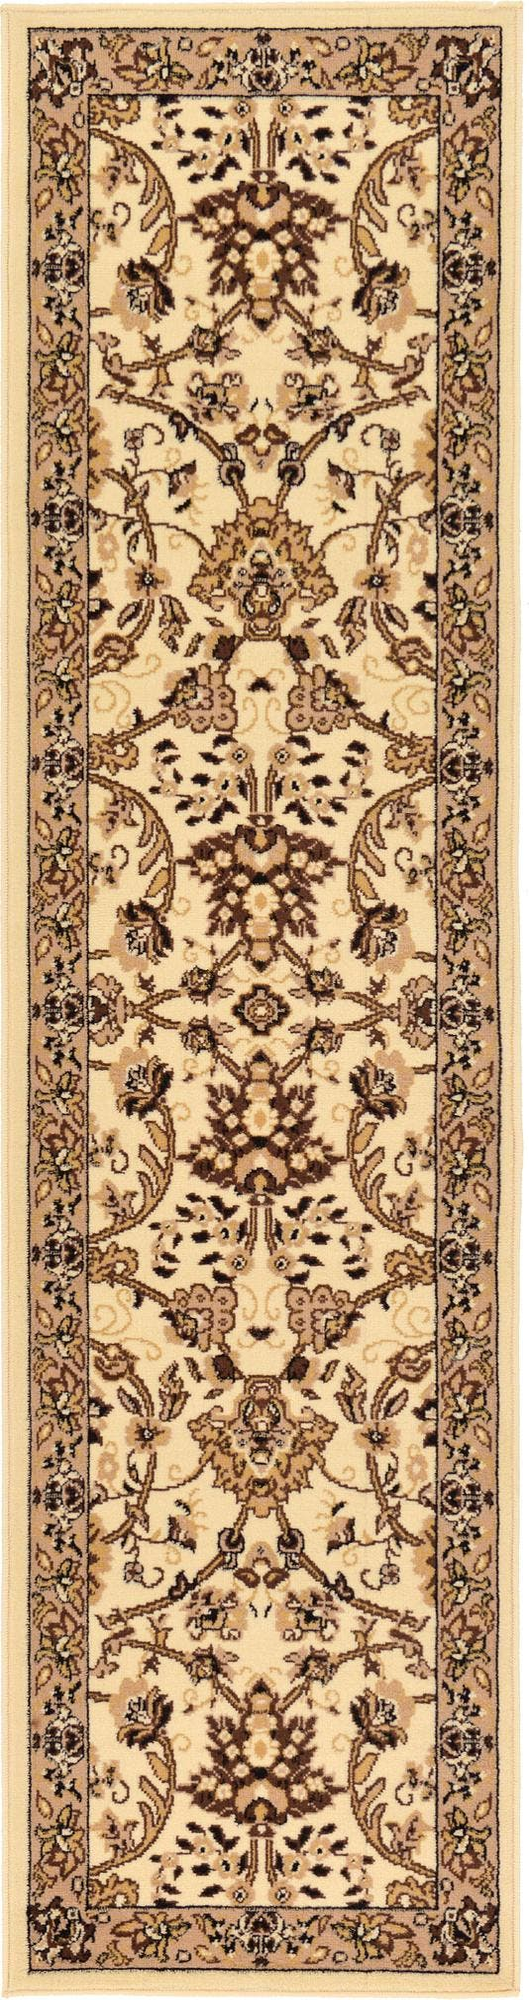 2' 2 x 8' 2 Kashan Design Runner Rug main image